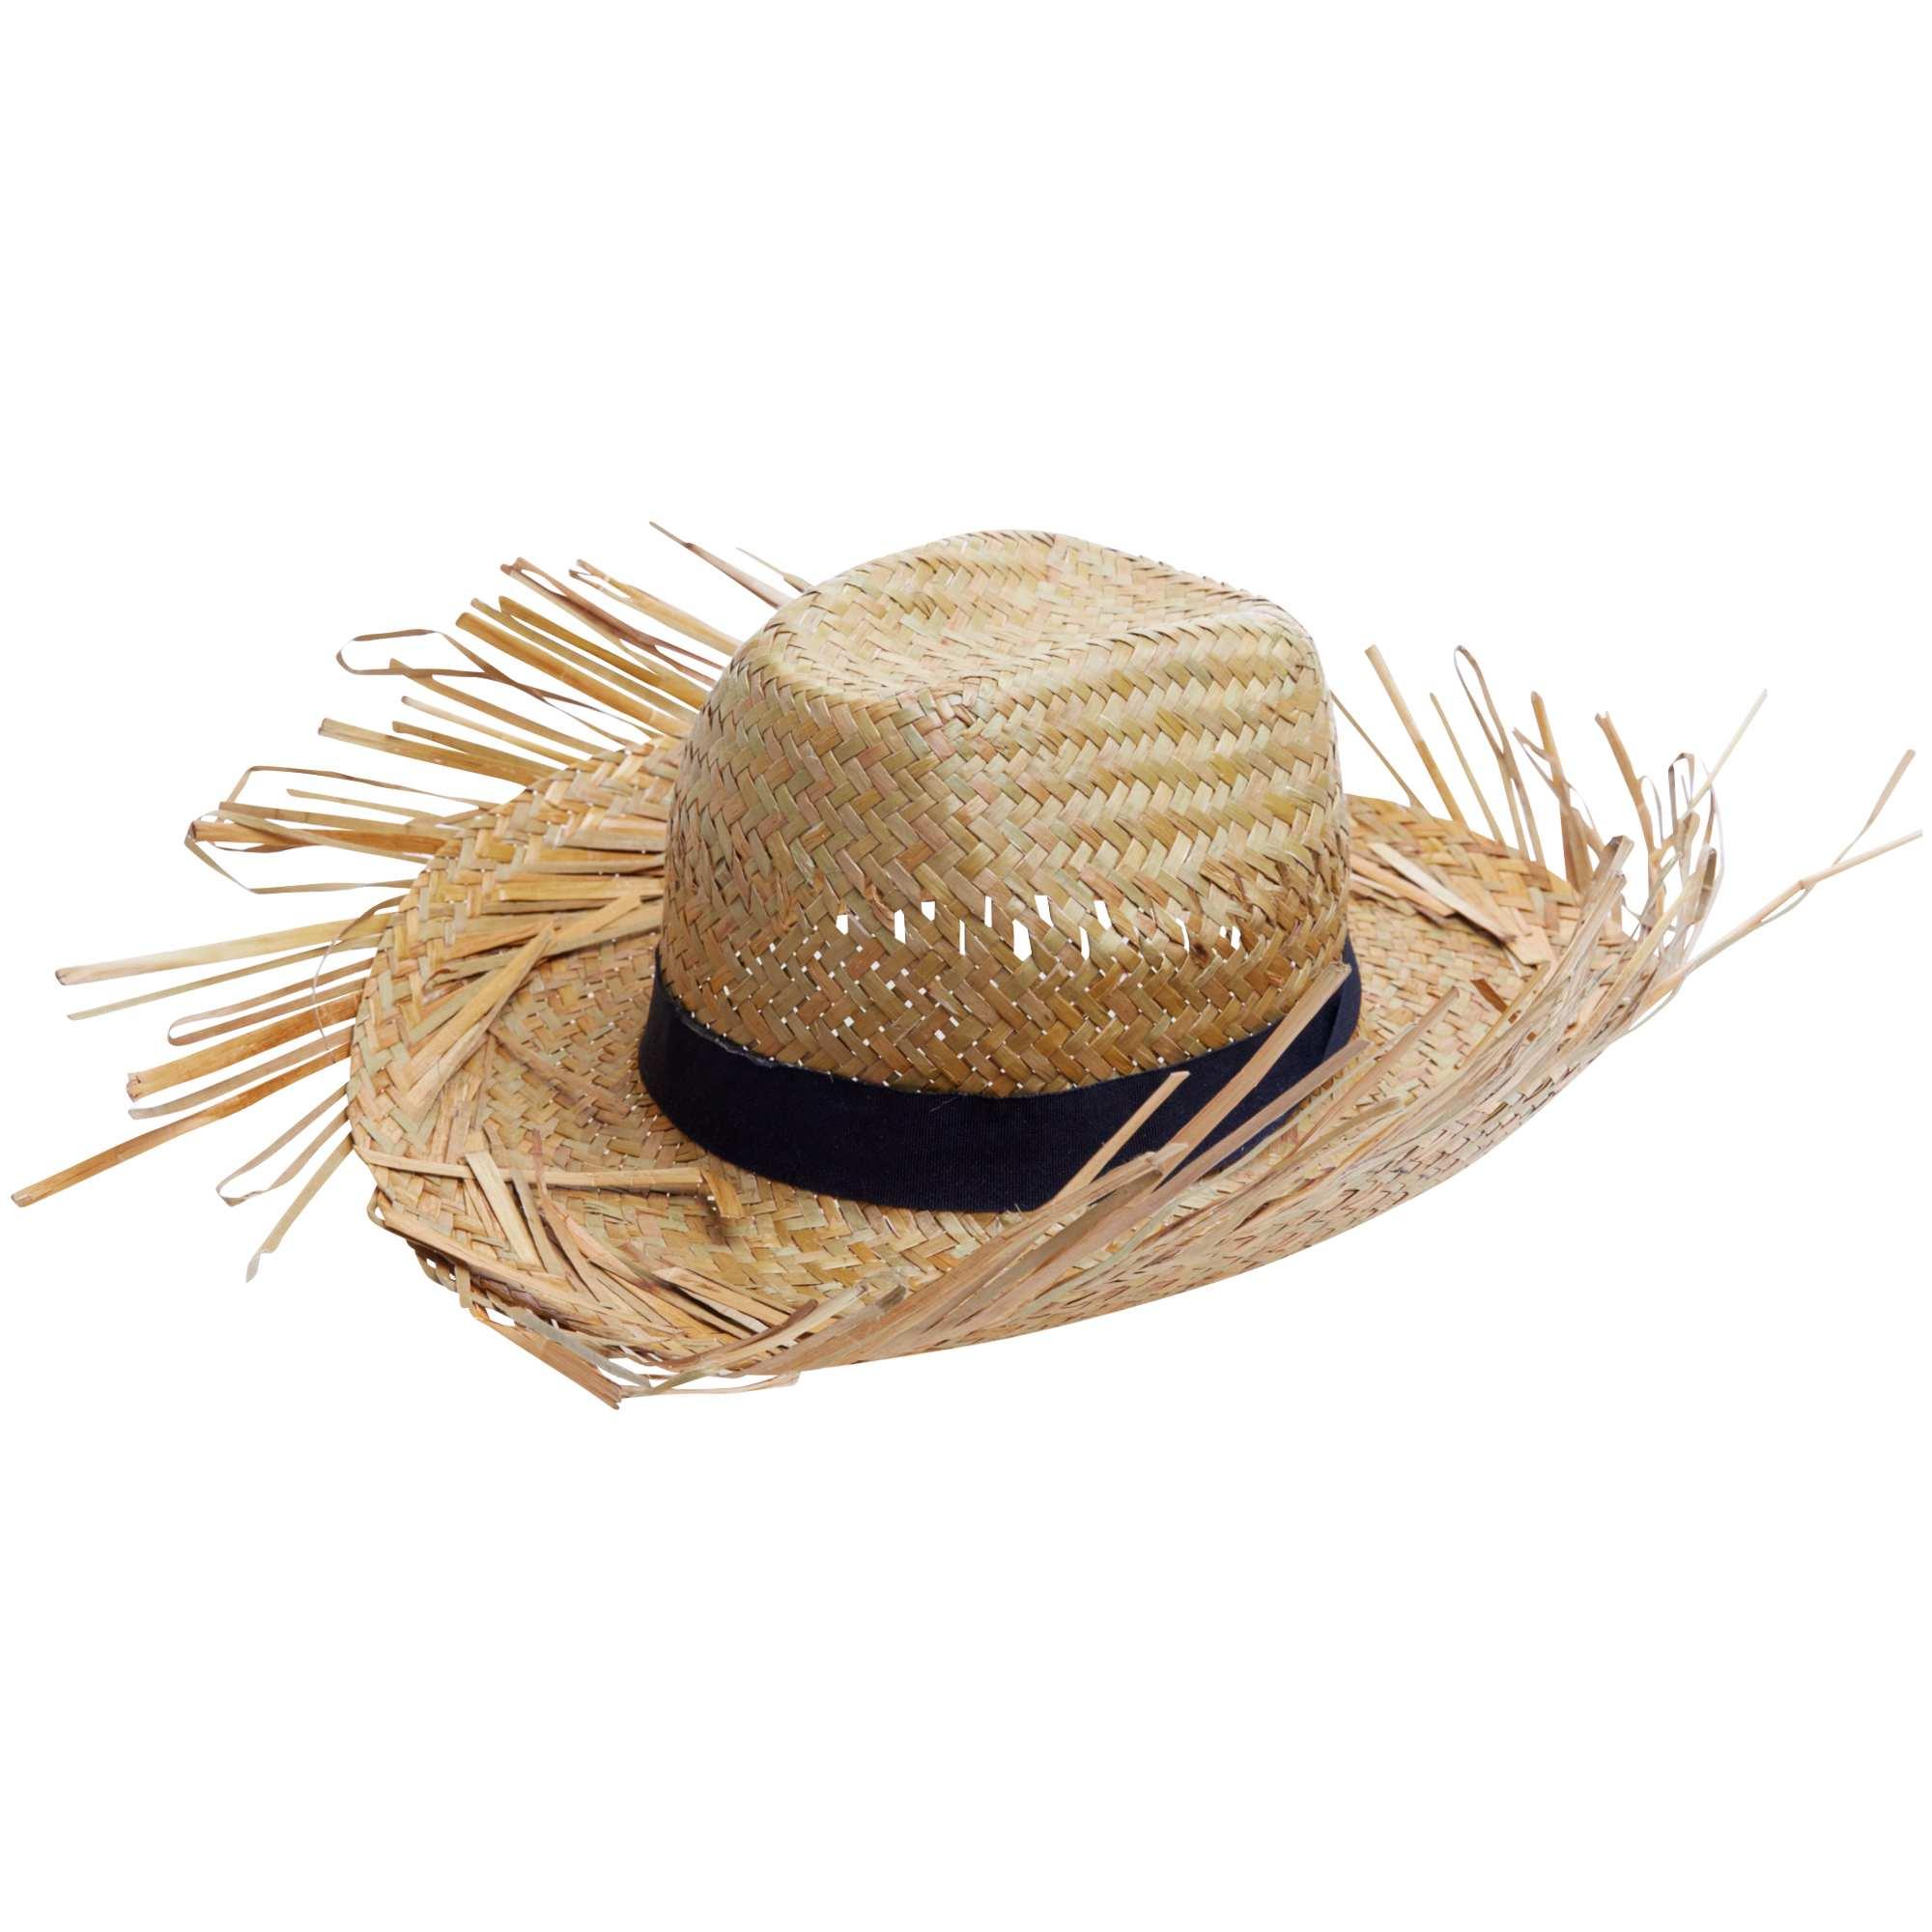 Sombrero de paja Accesorios - beige - Kiabi - 3,50€